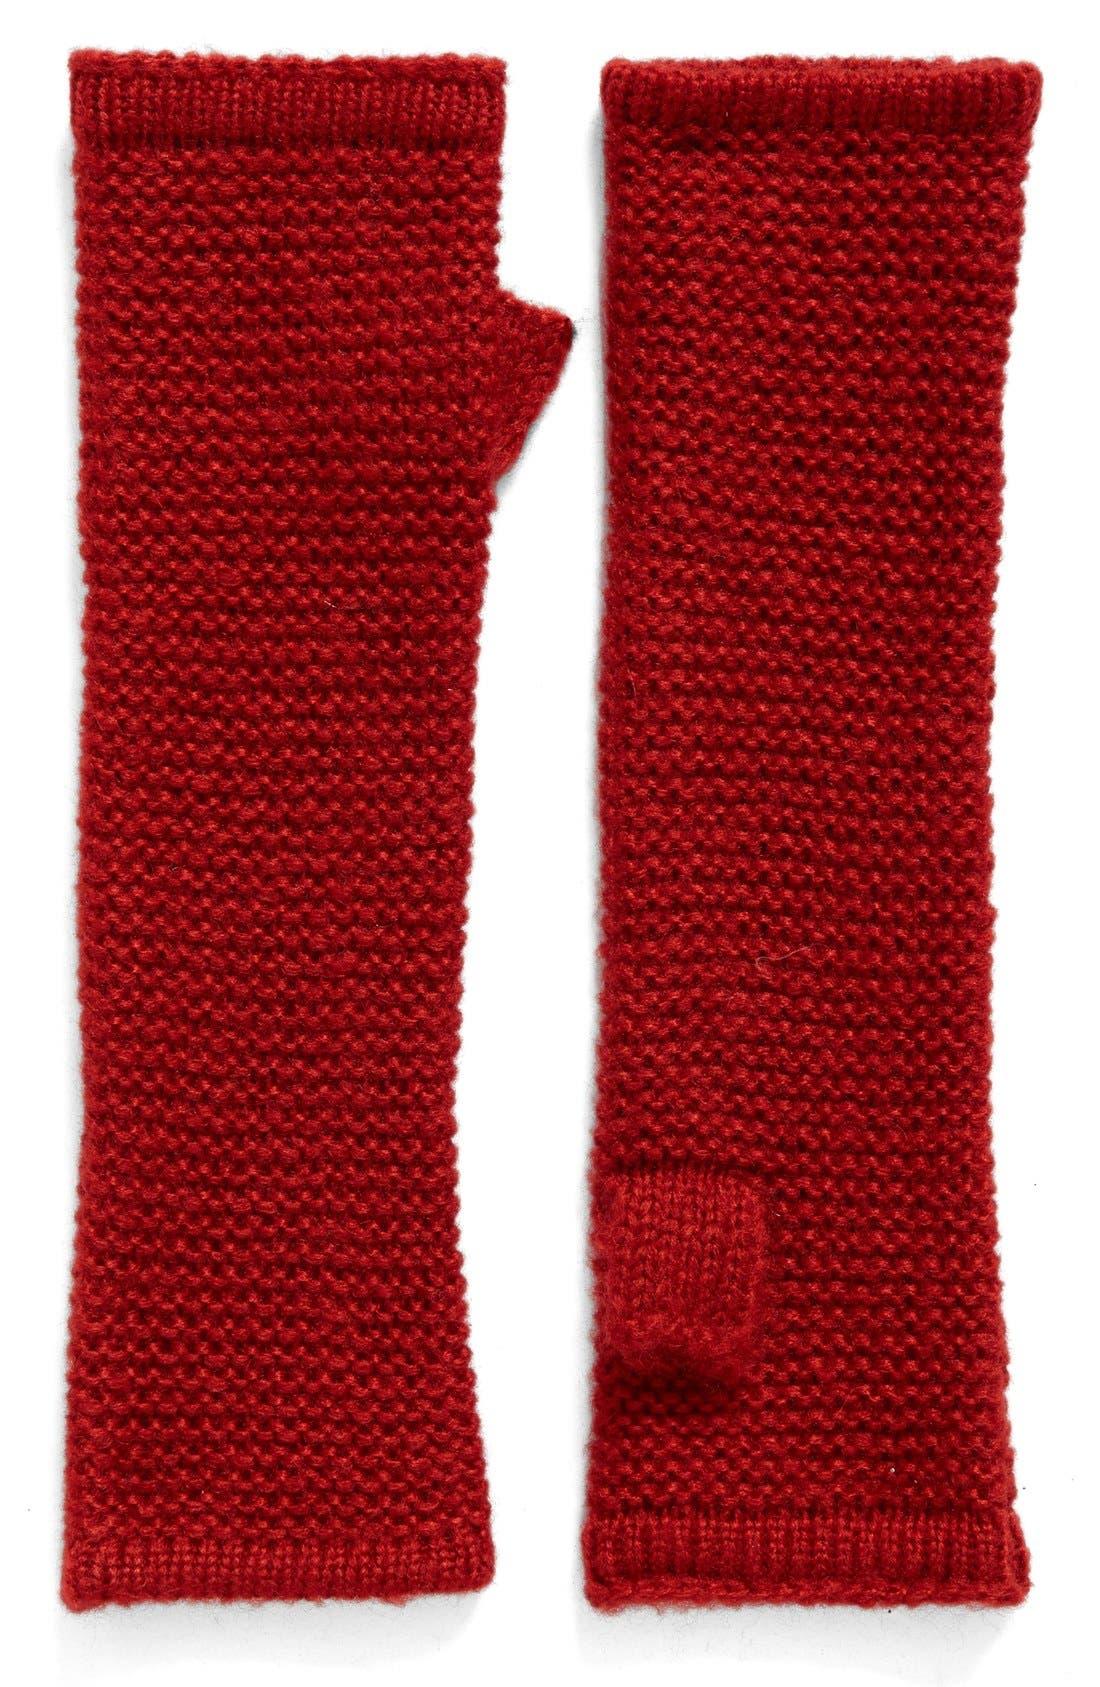 Alternate Image 1 Selected - Rebecca Minkoff Garter Stitch Fingerless Gloves